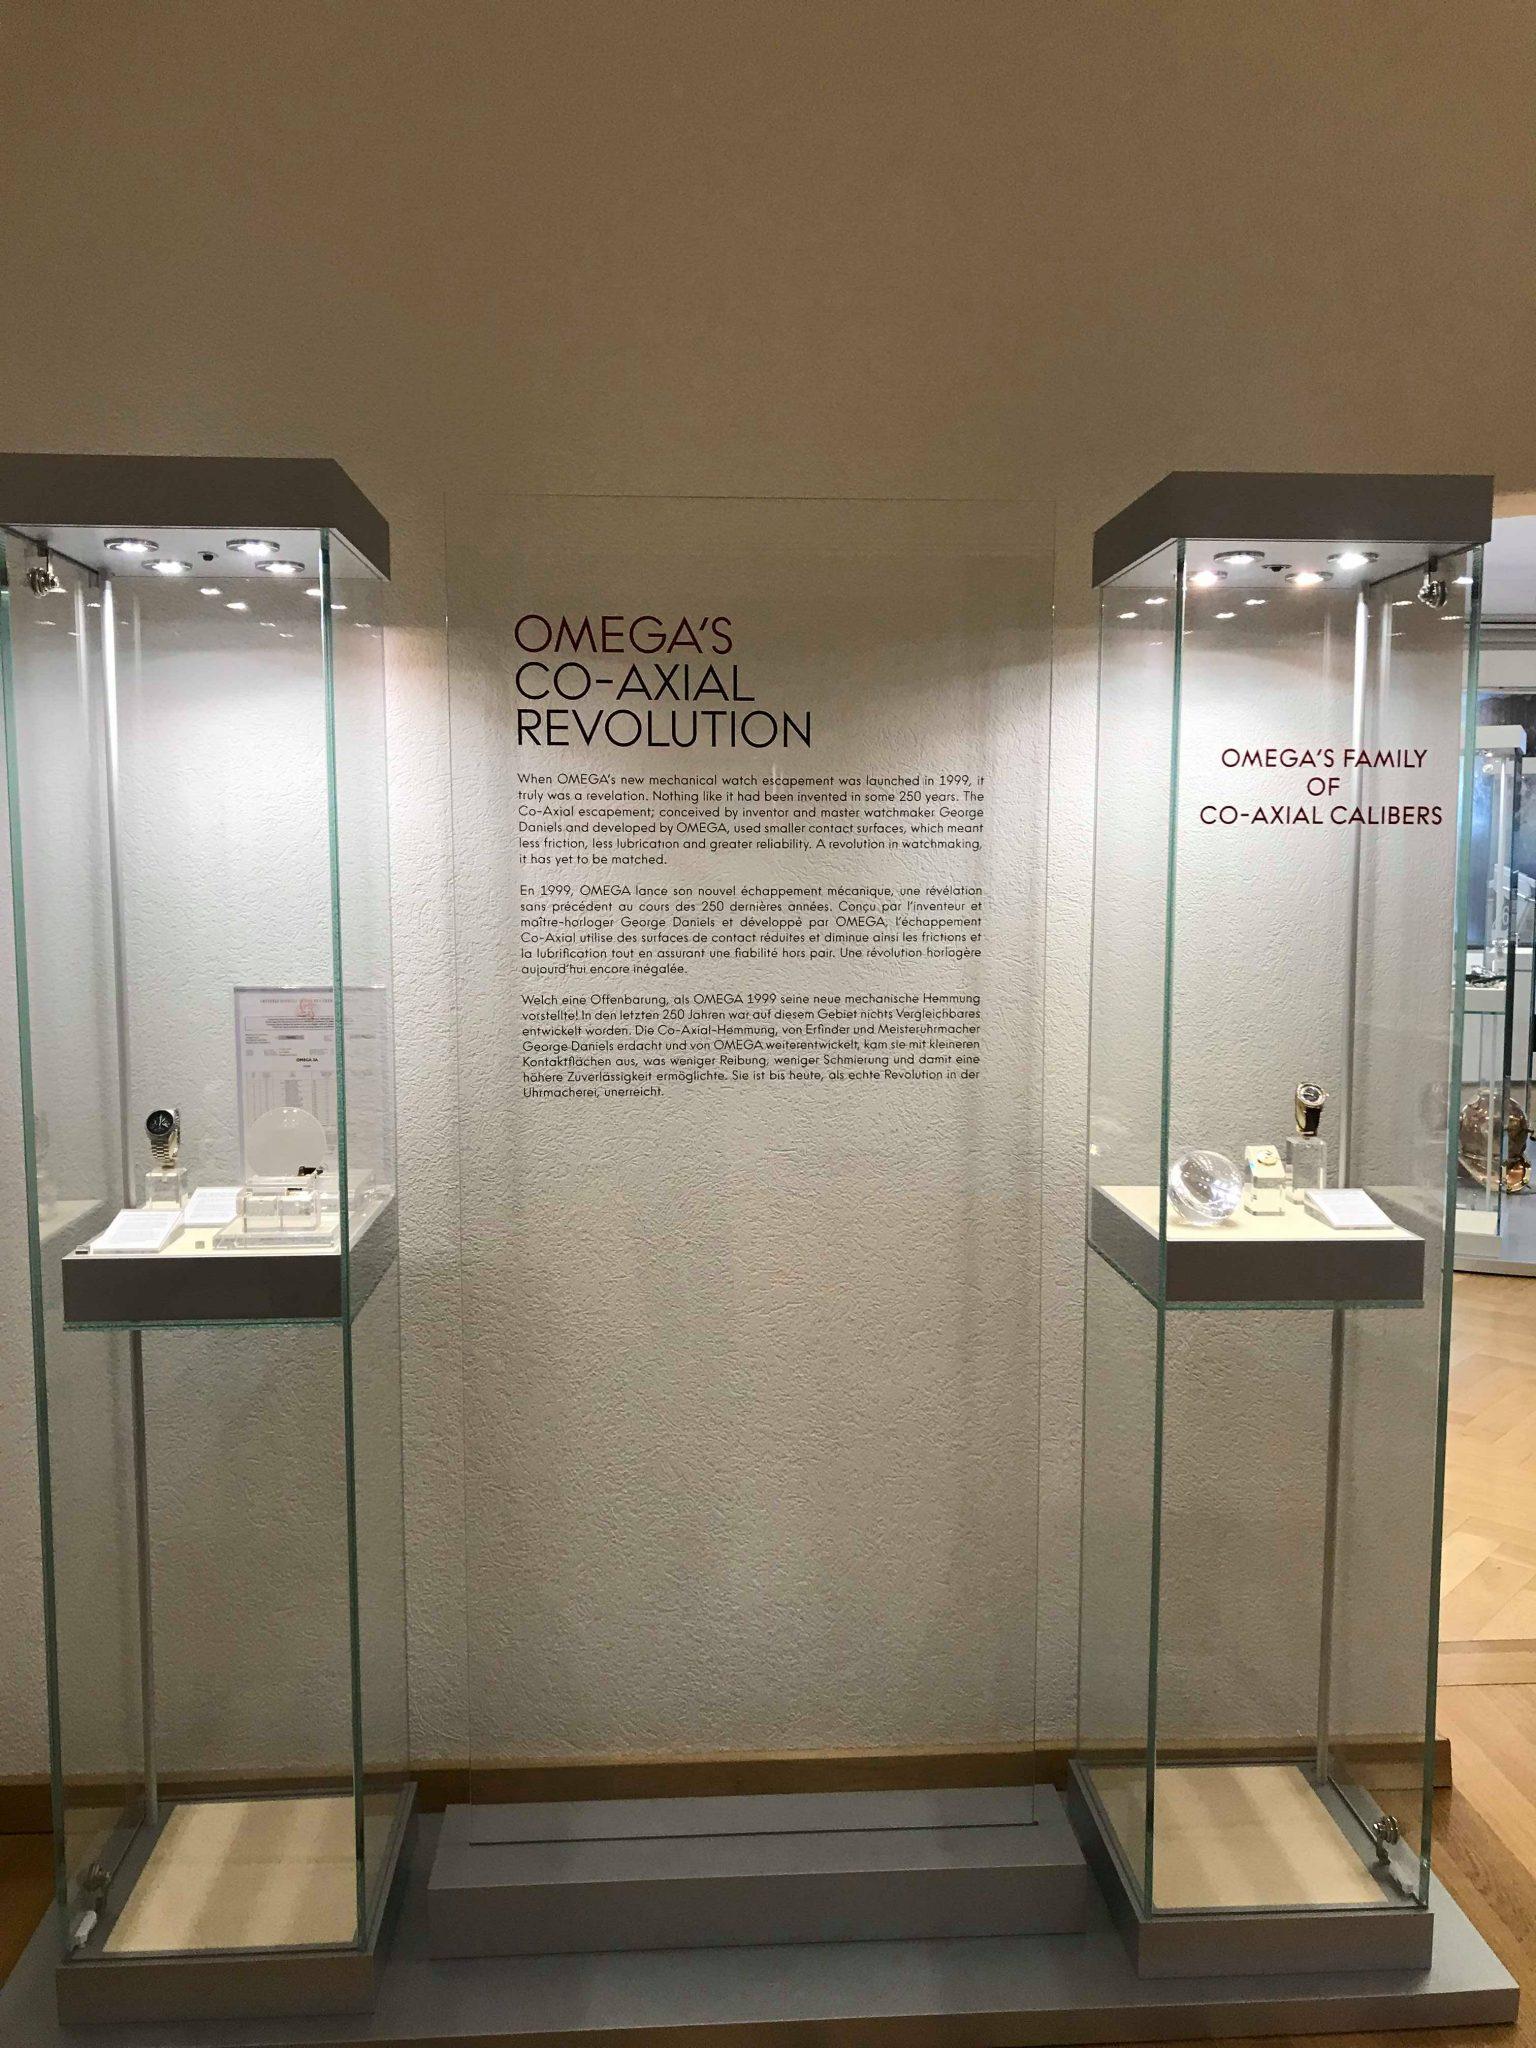 Co-axial, Omega museum, Biel, Switzerland